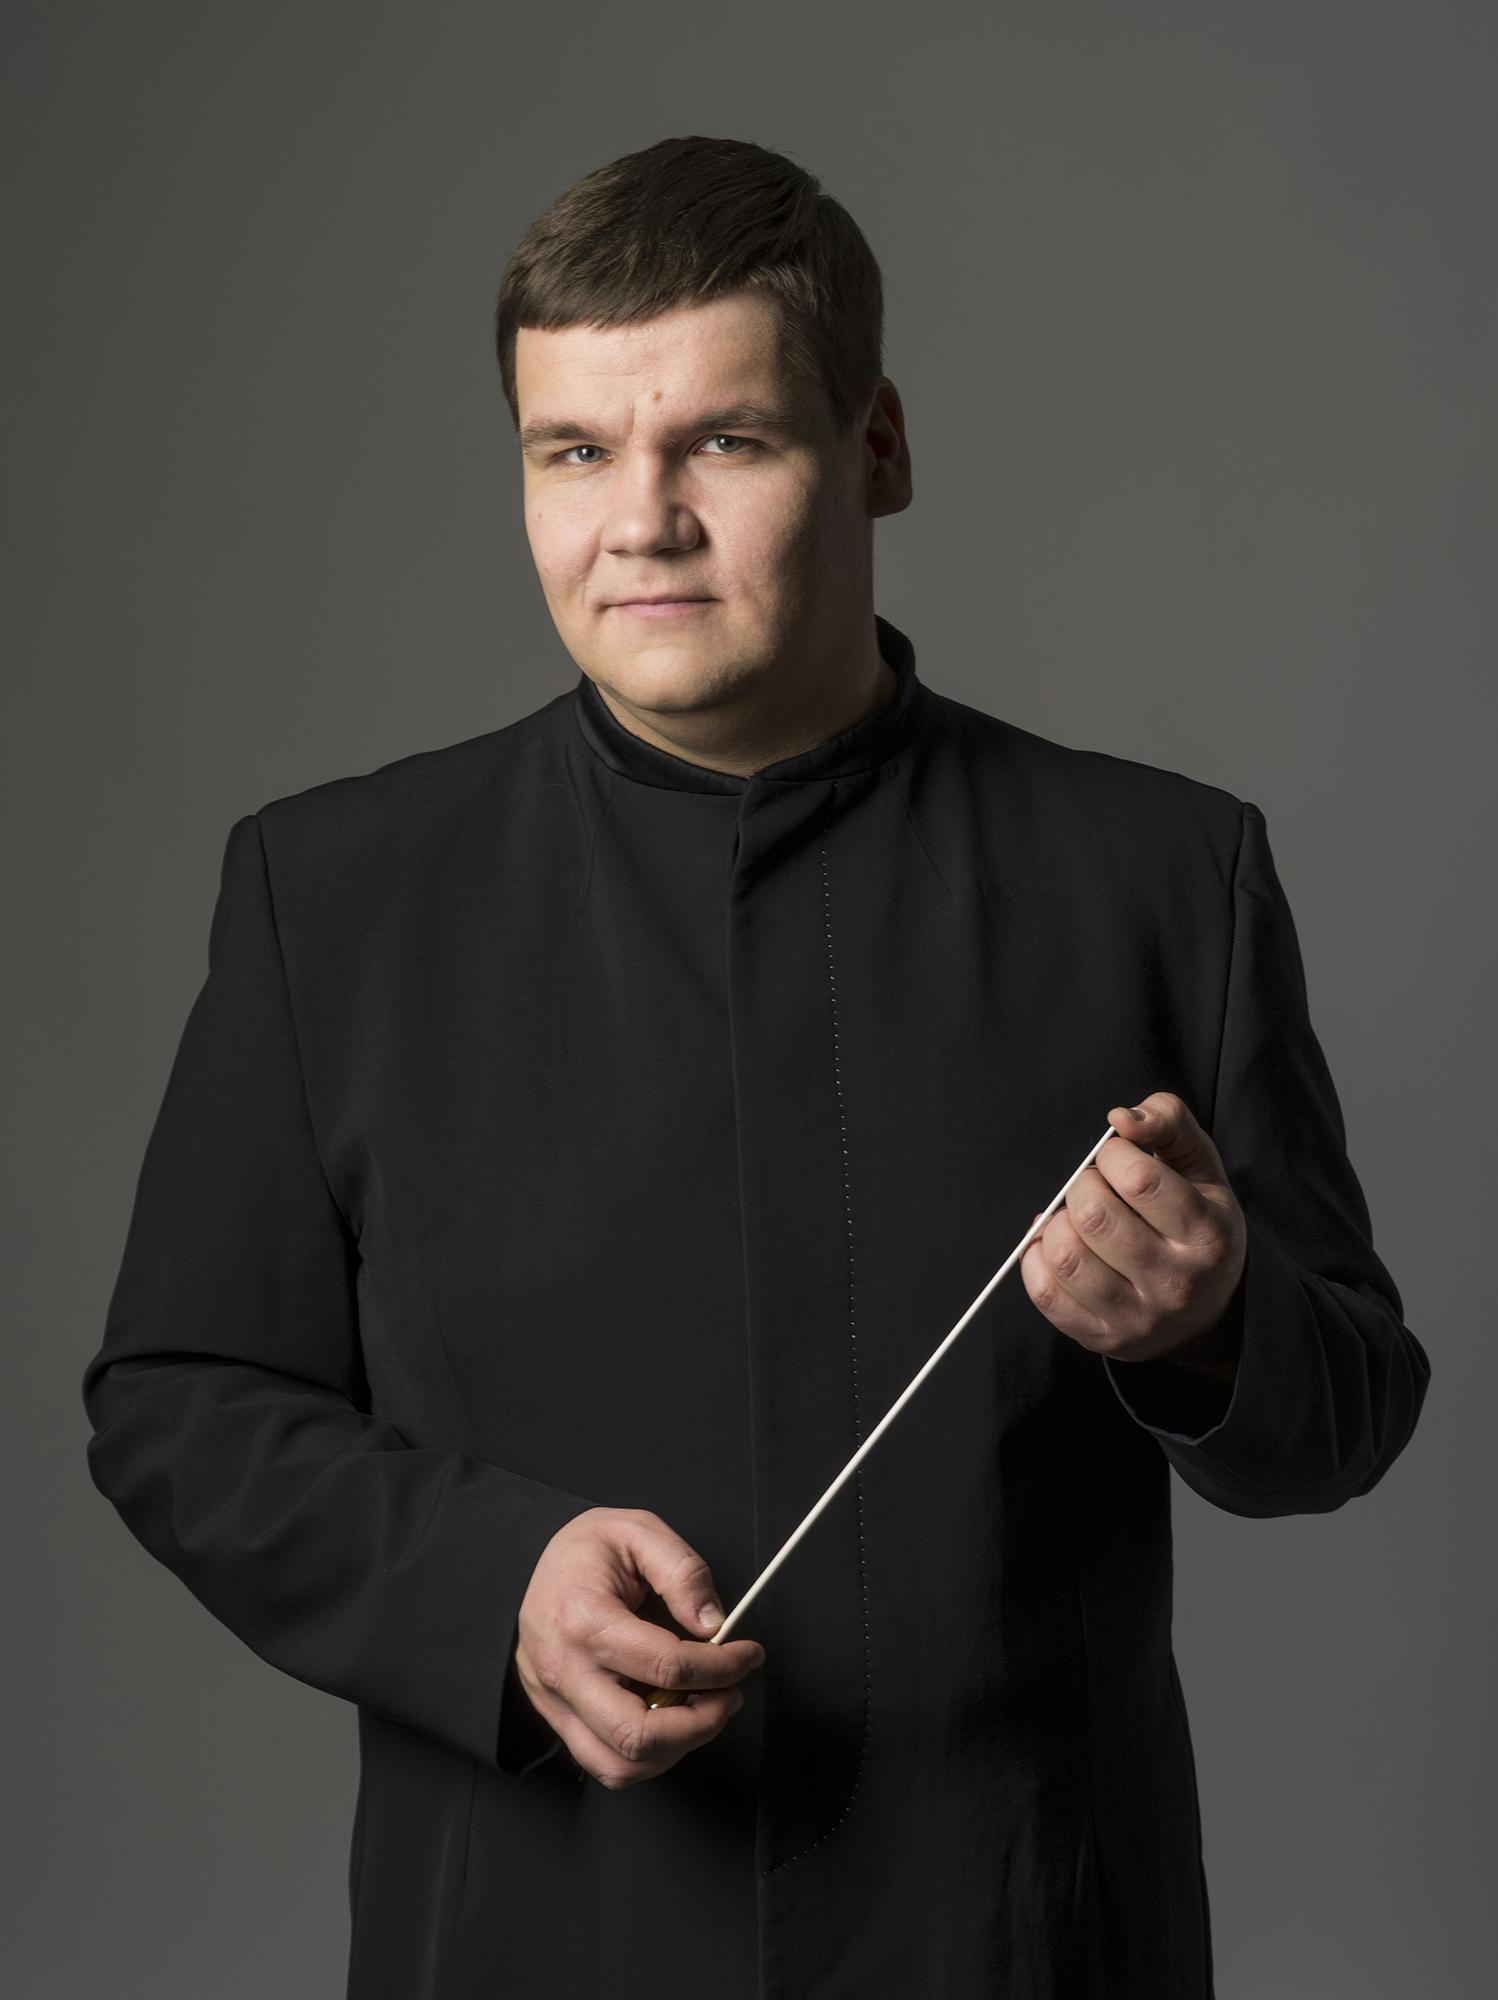 ANDRIS POGA: with Orquestra Gulbenkian